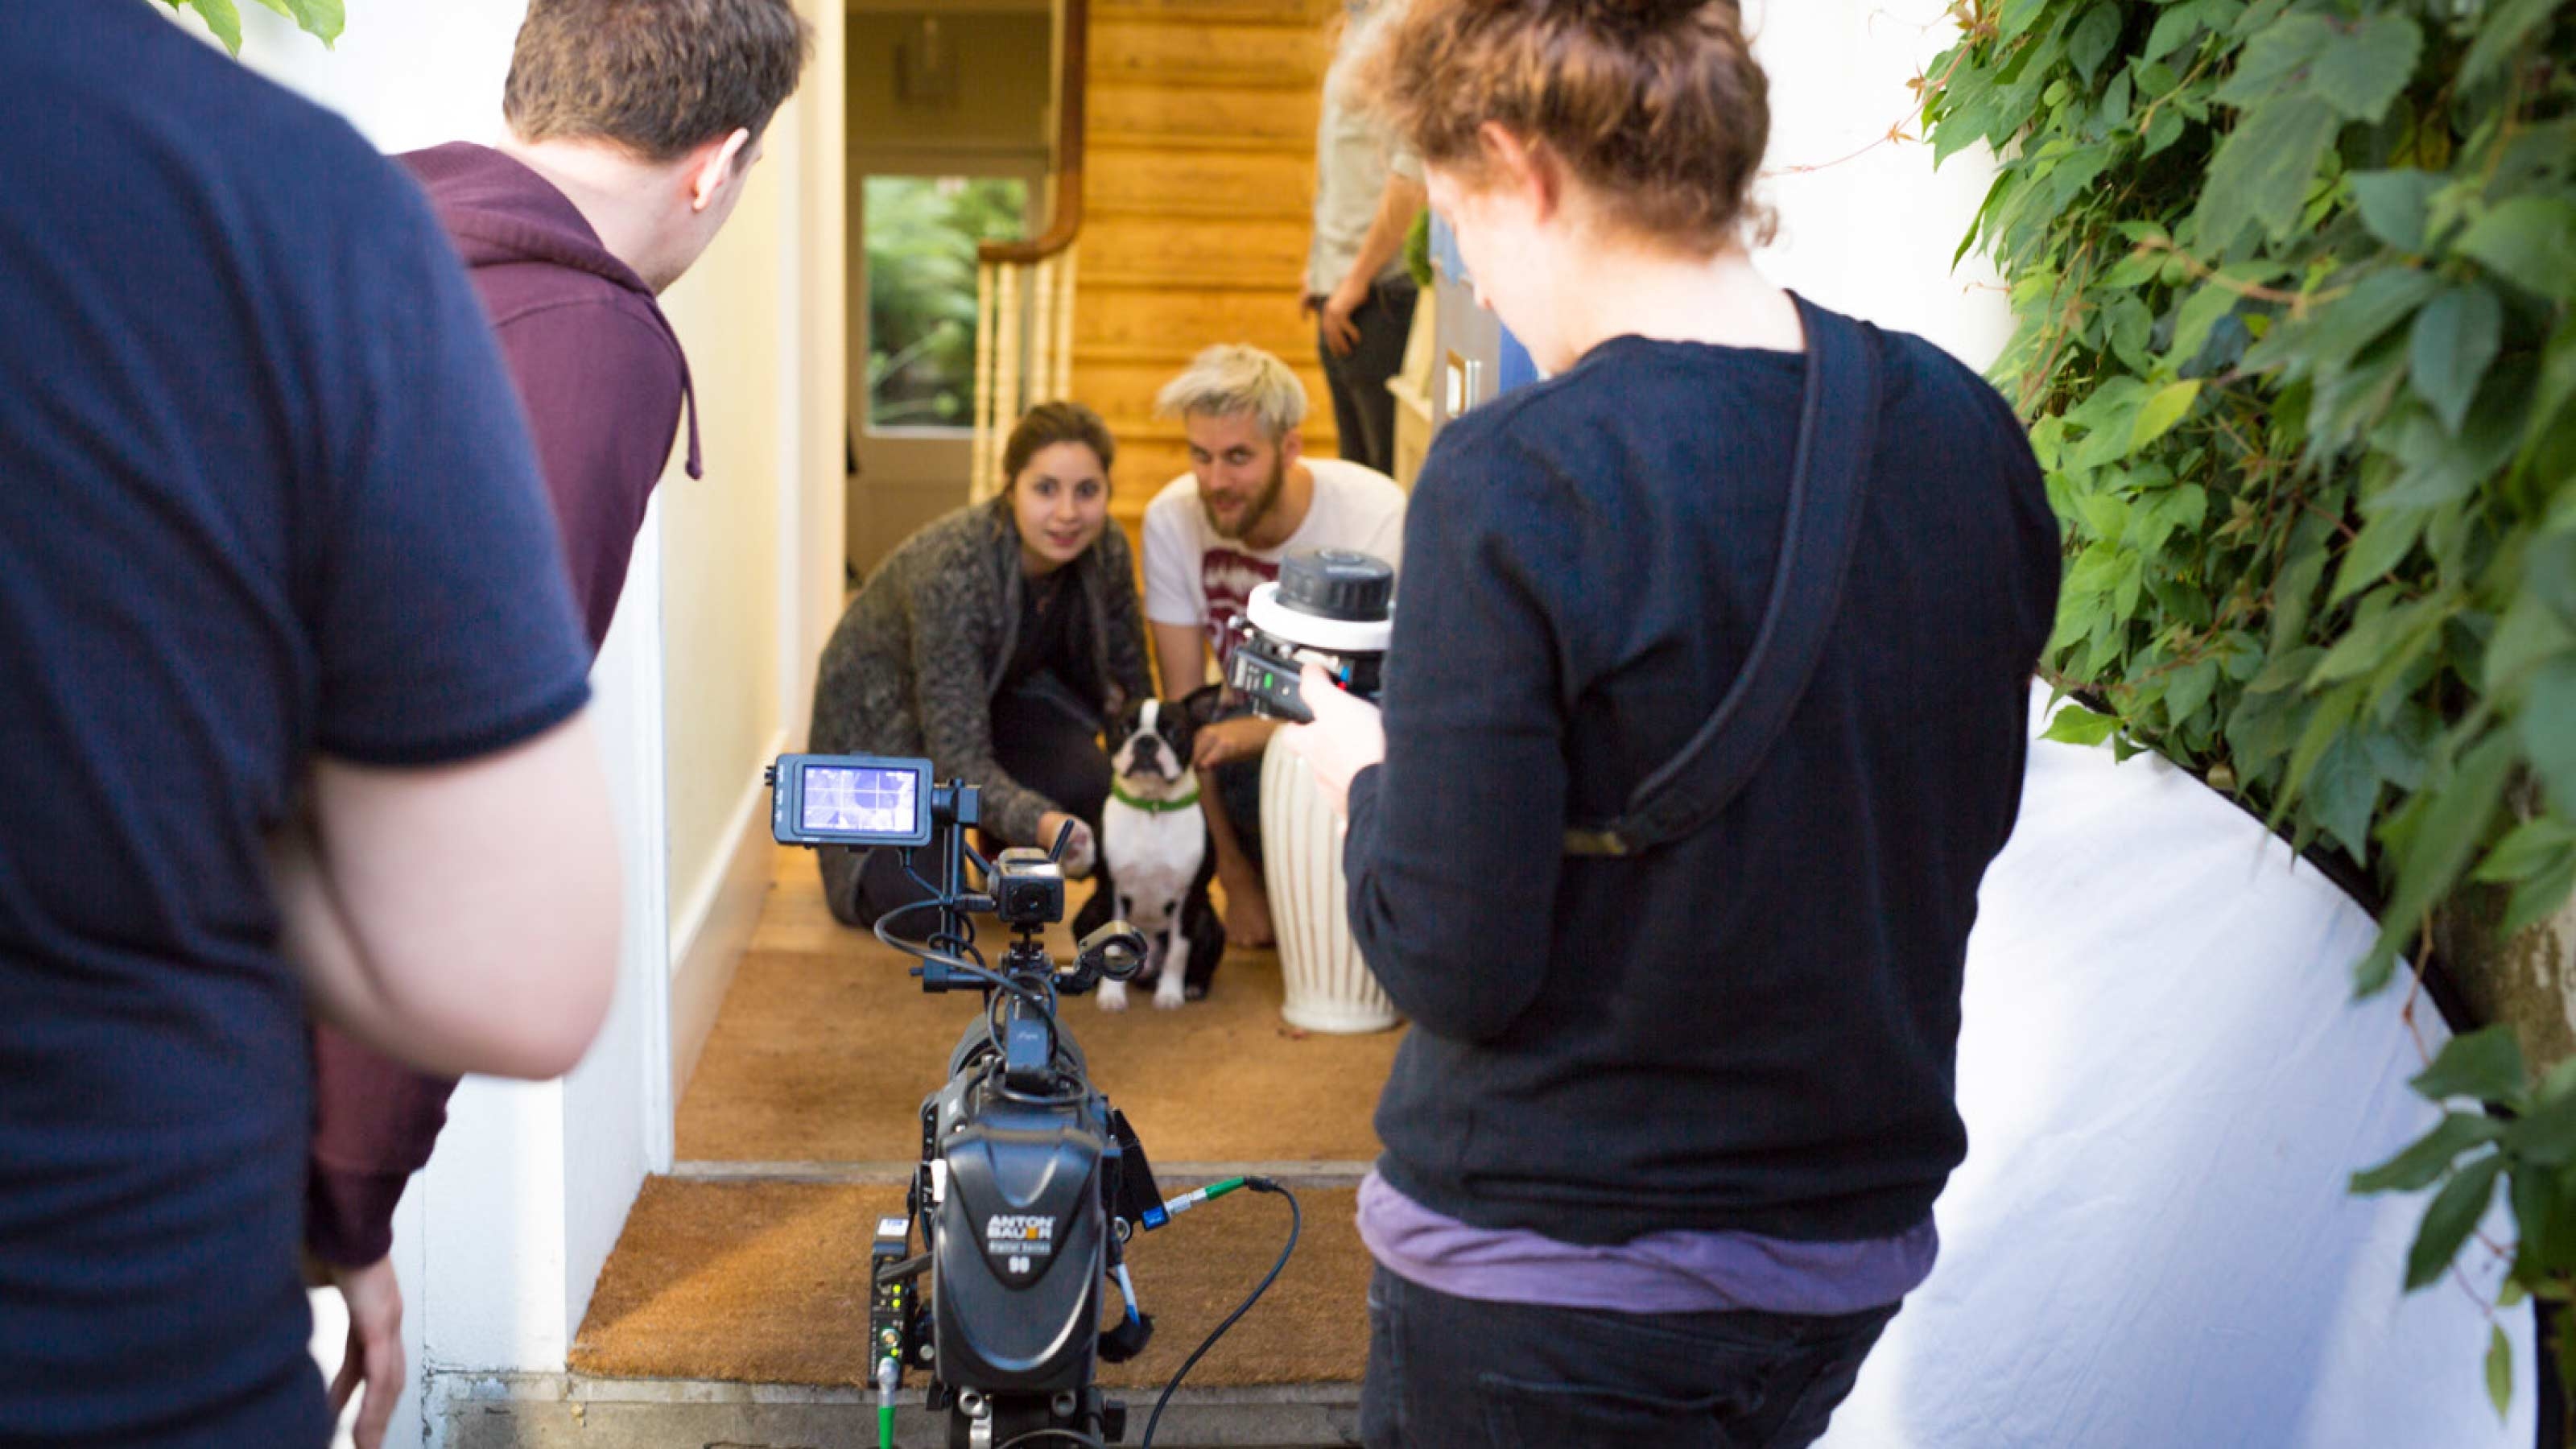 Marketing_shooting_video_Coreco